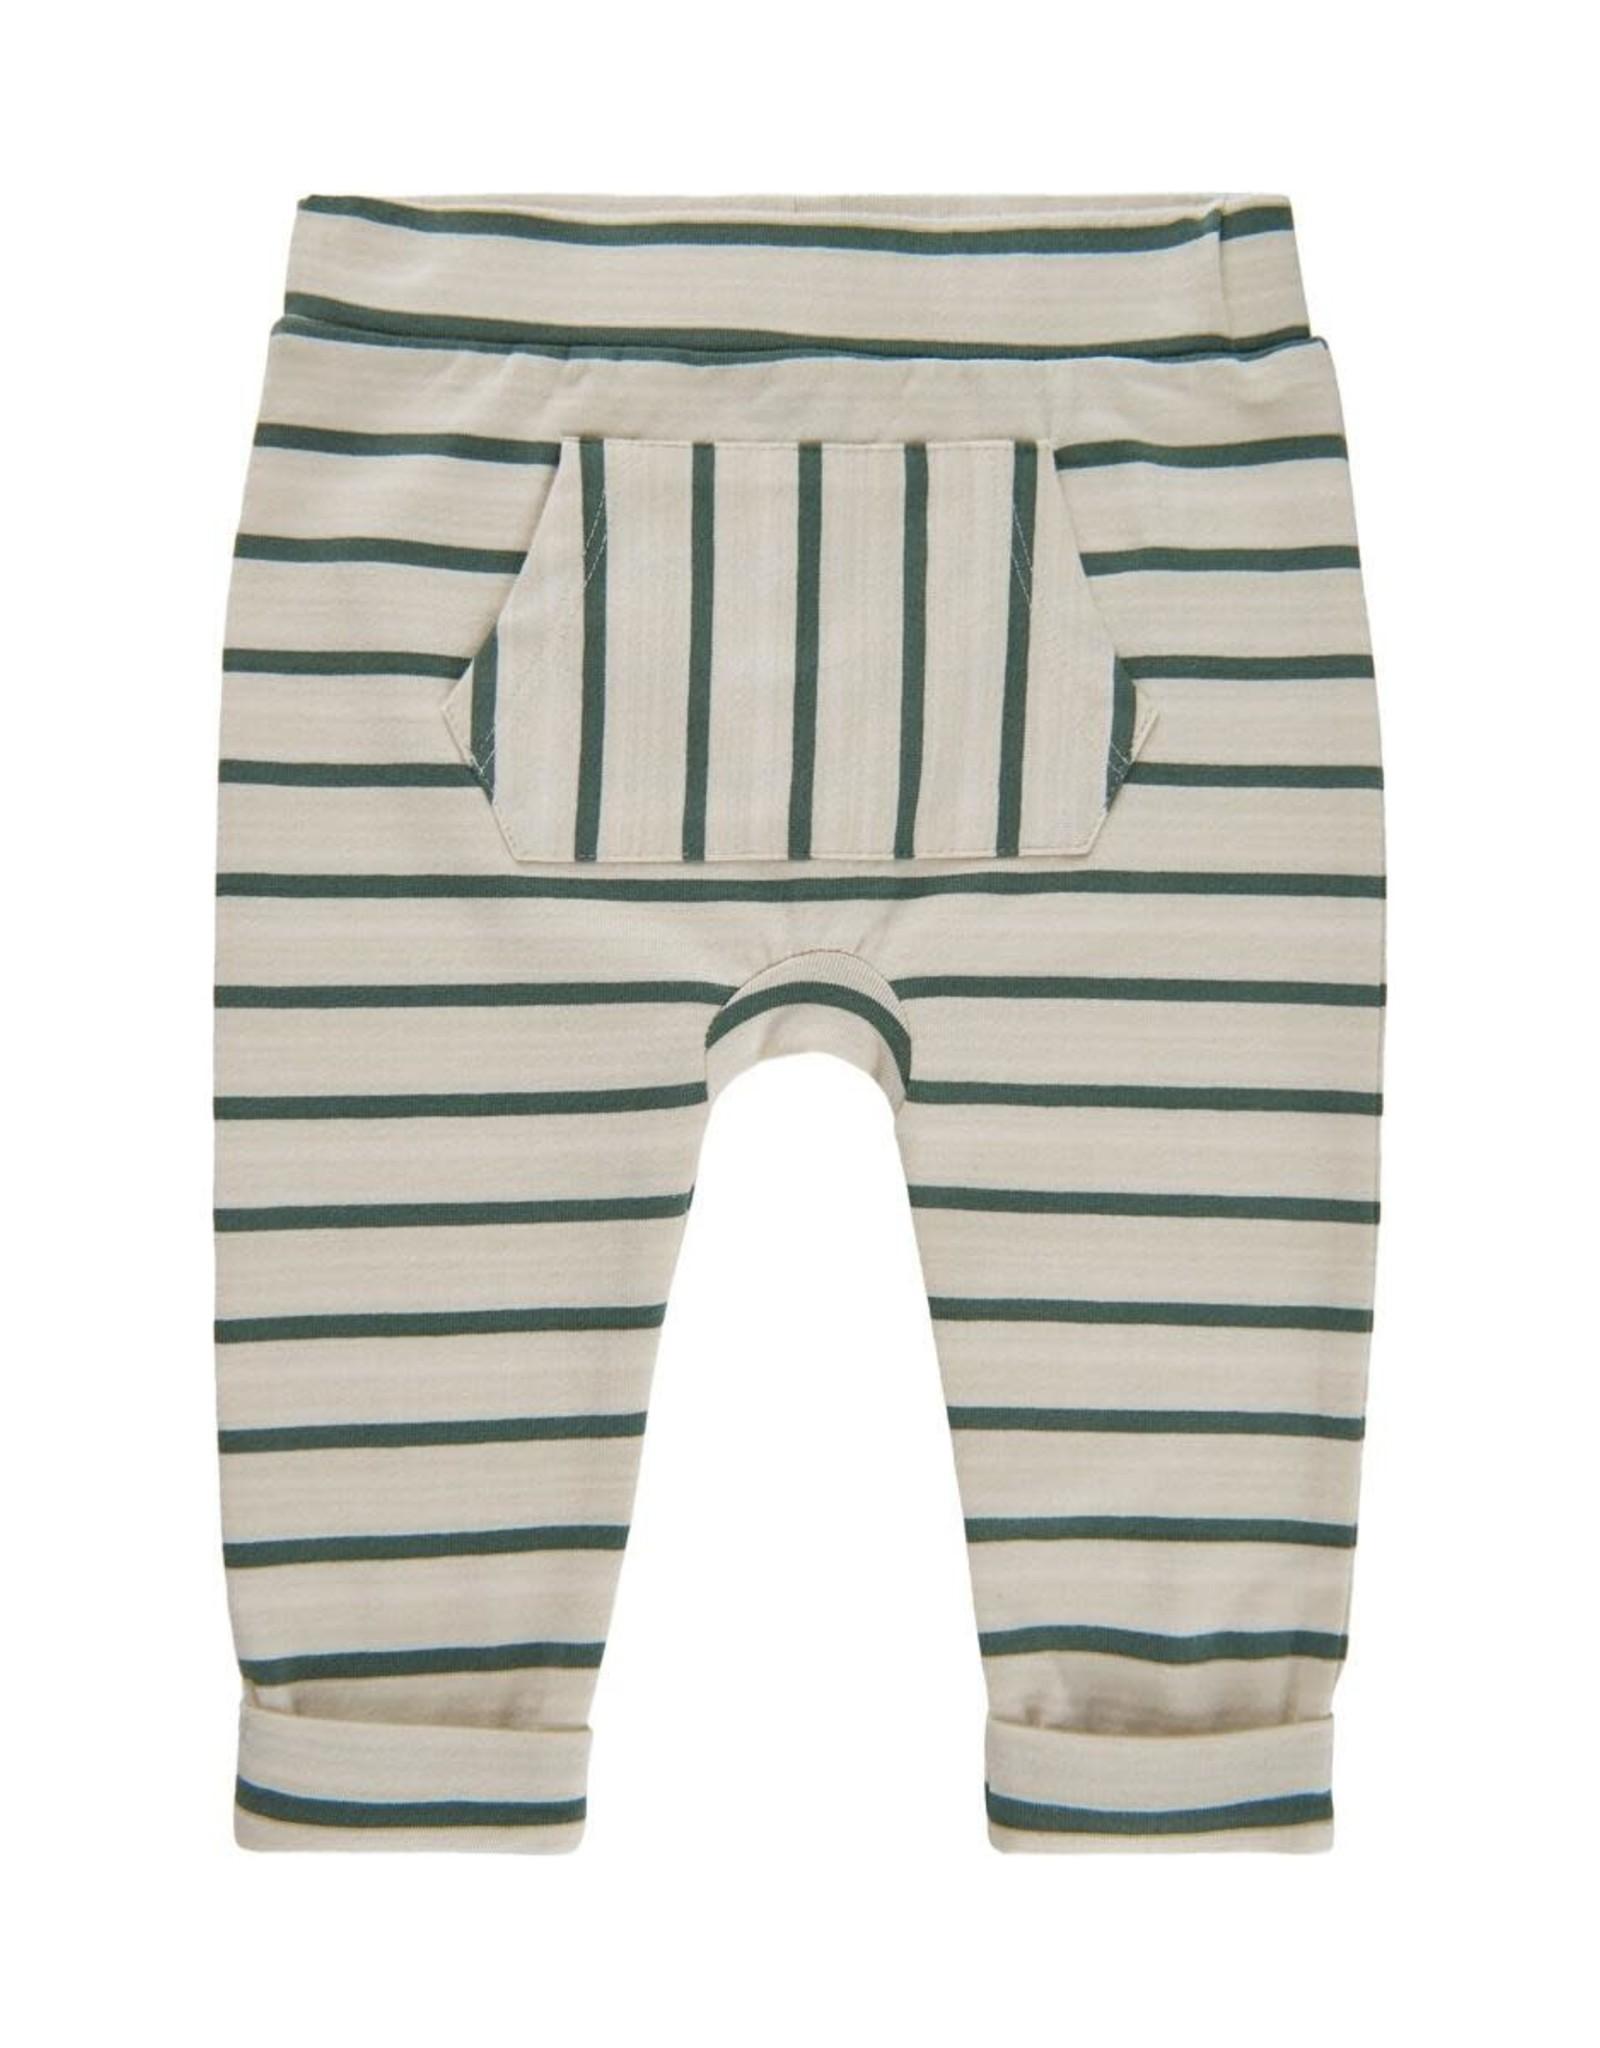 Minymo Olive Stripe Pant